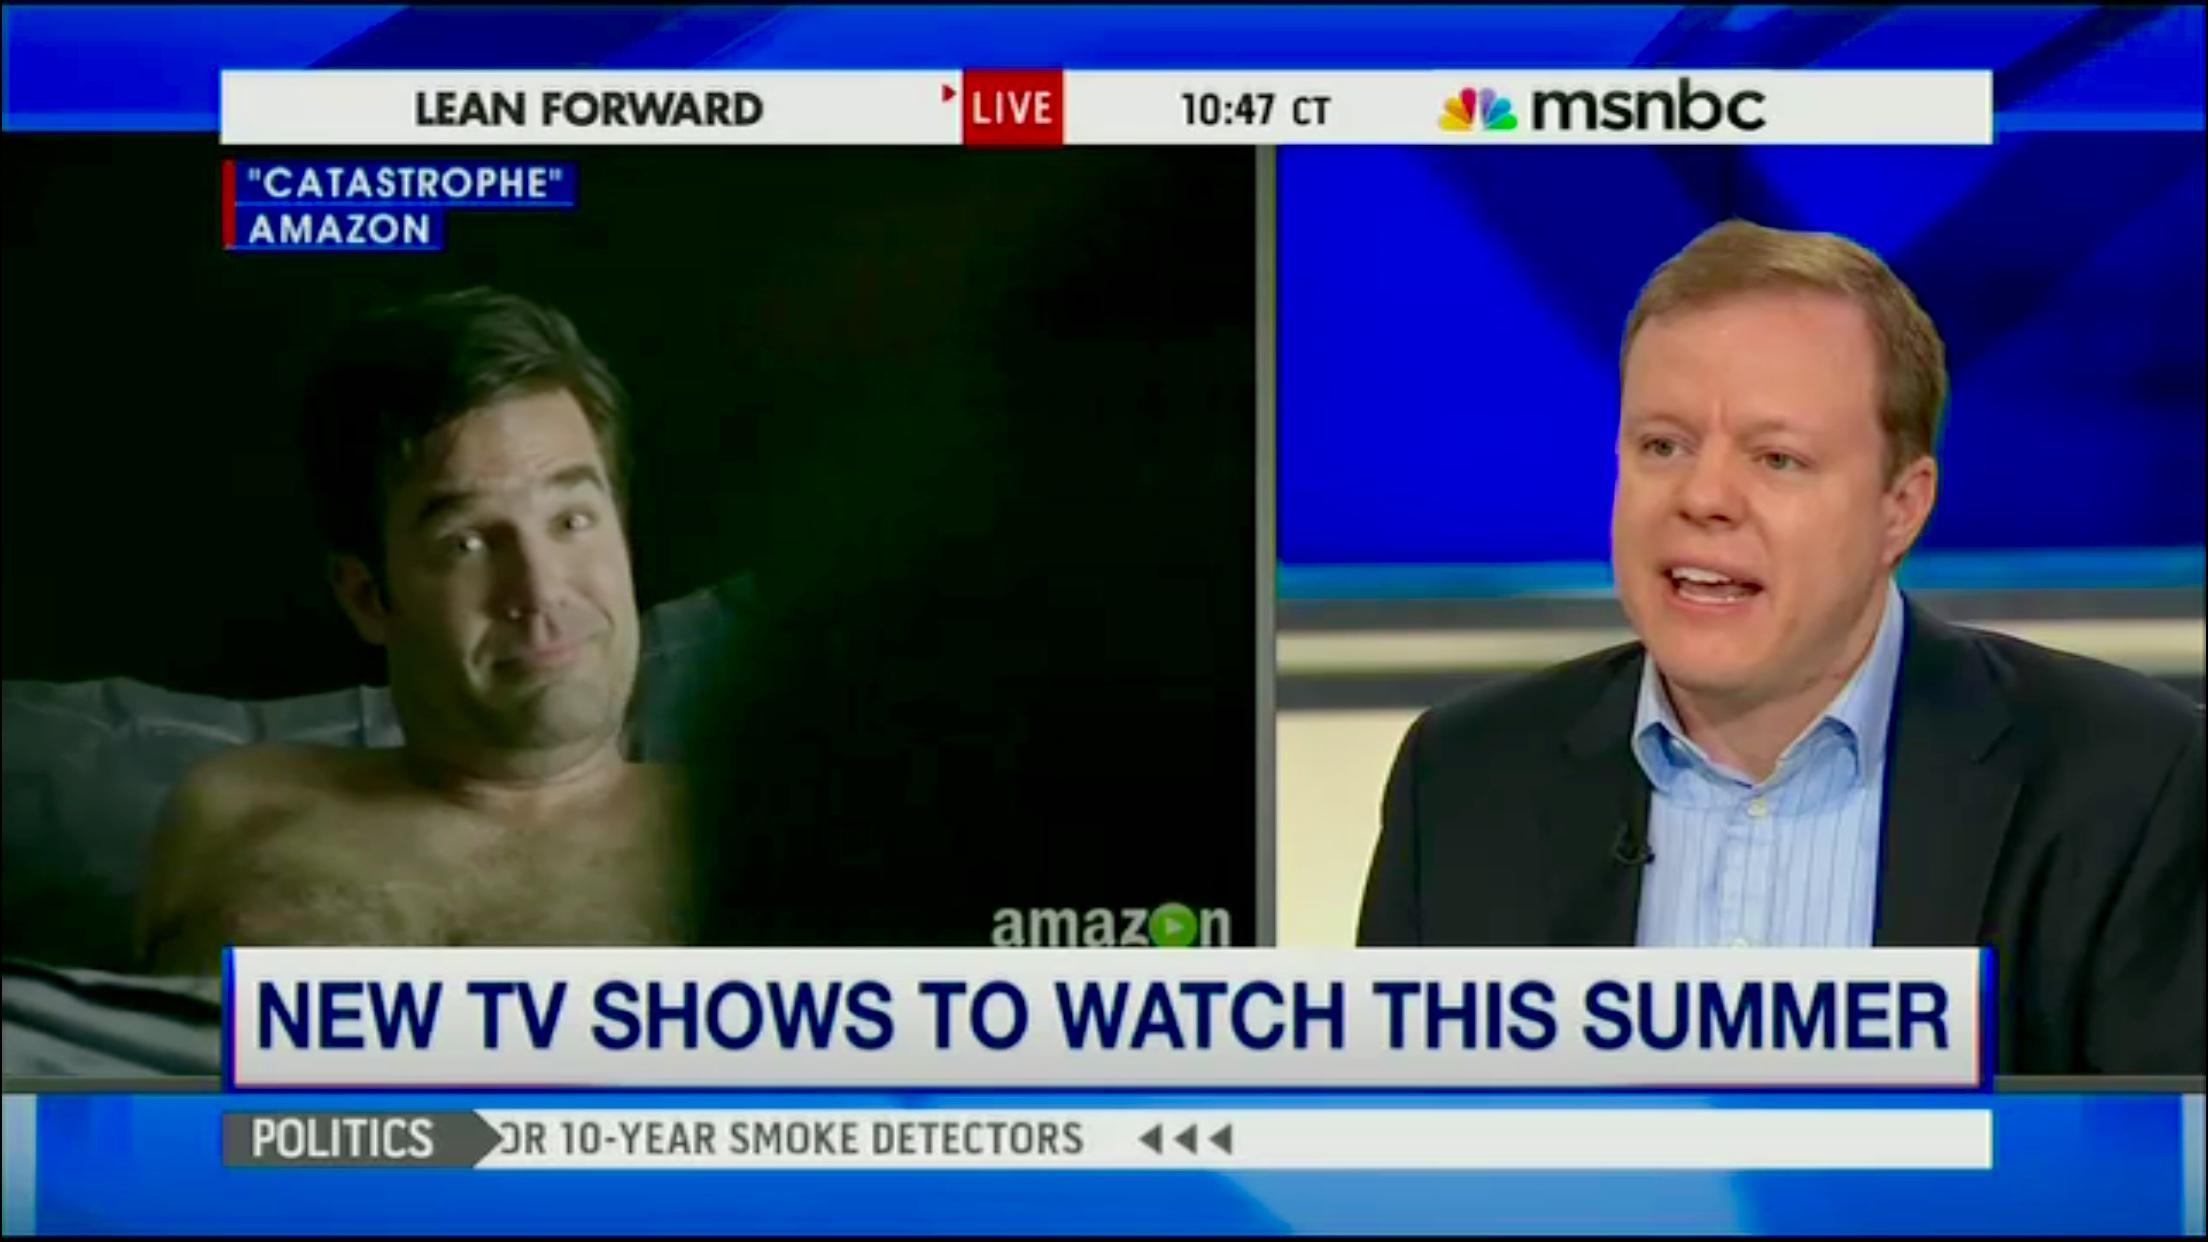 MSNBC Summer TV 2